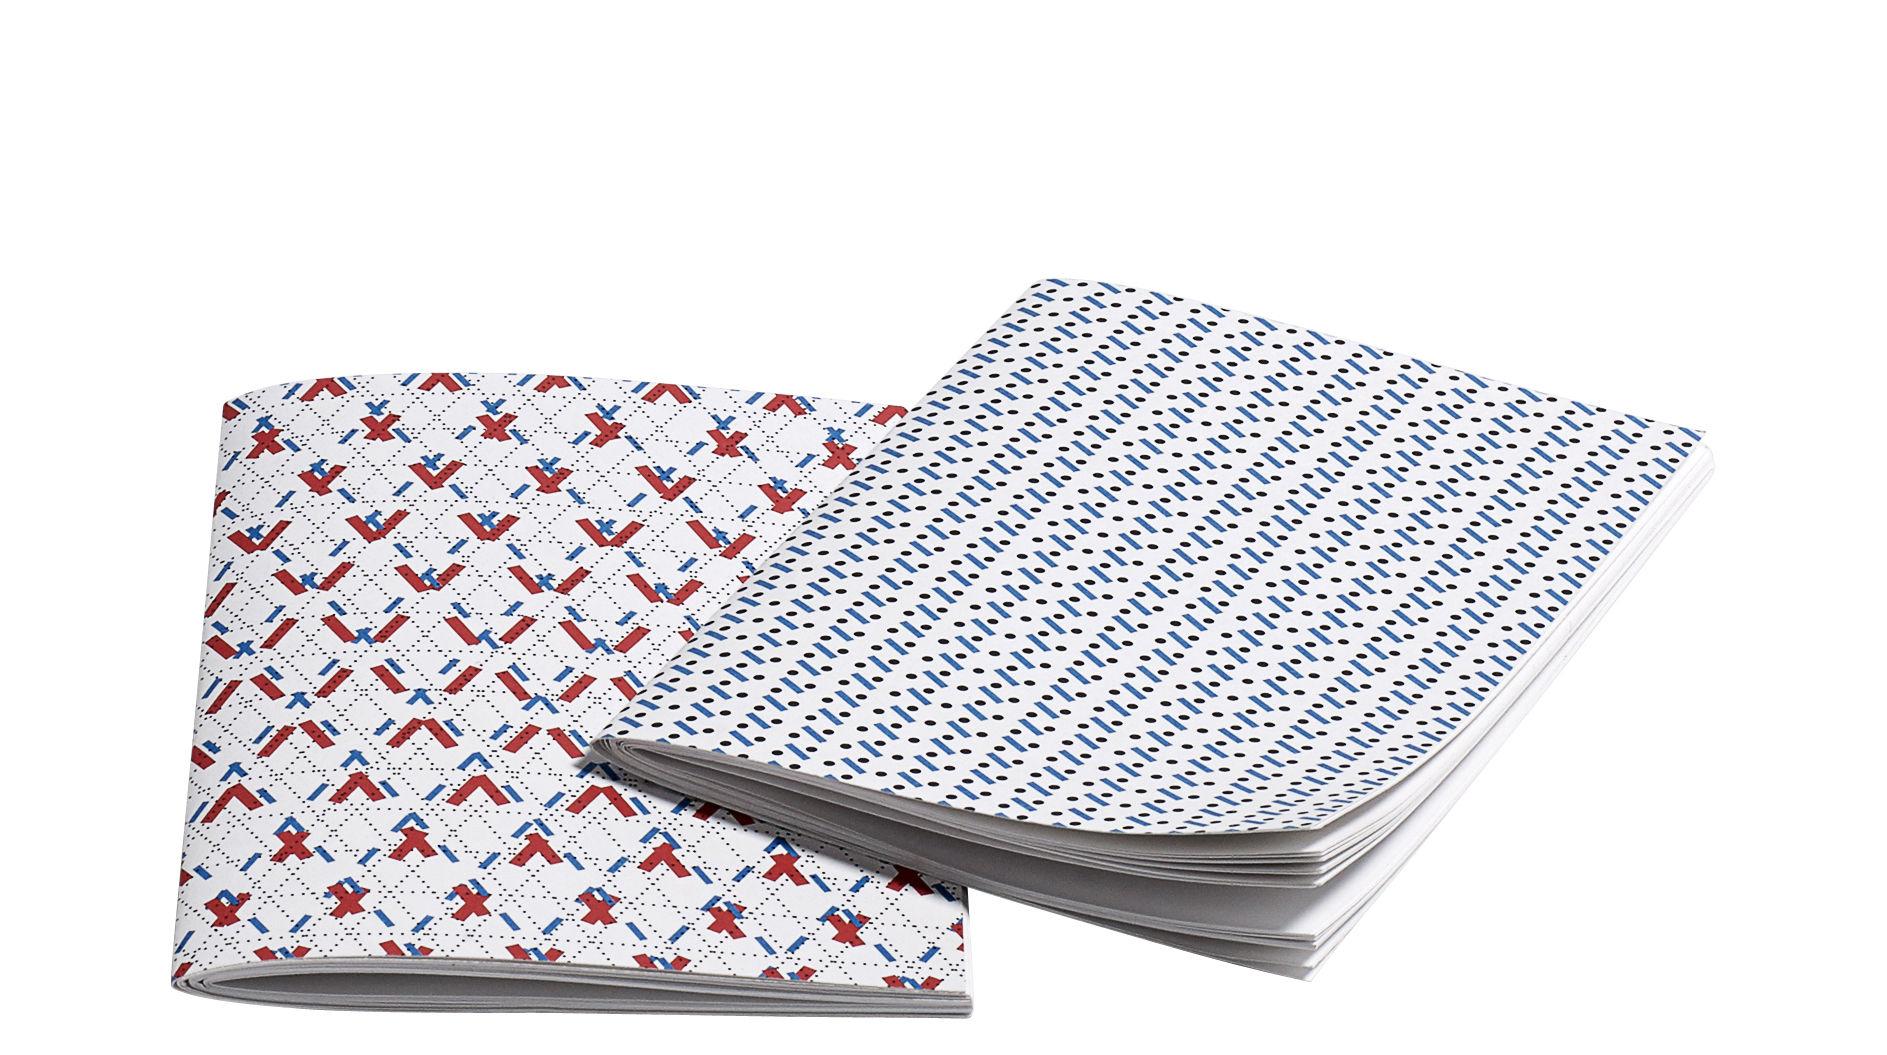 Accessoires - Accessoires für das Büro - Line Dot Small Heft / 2er-Set - 14 x 9,5 cm - Hay - Blau & rot - Papierfaser